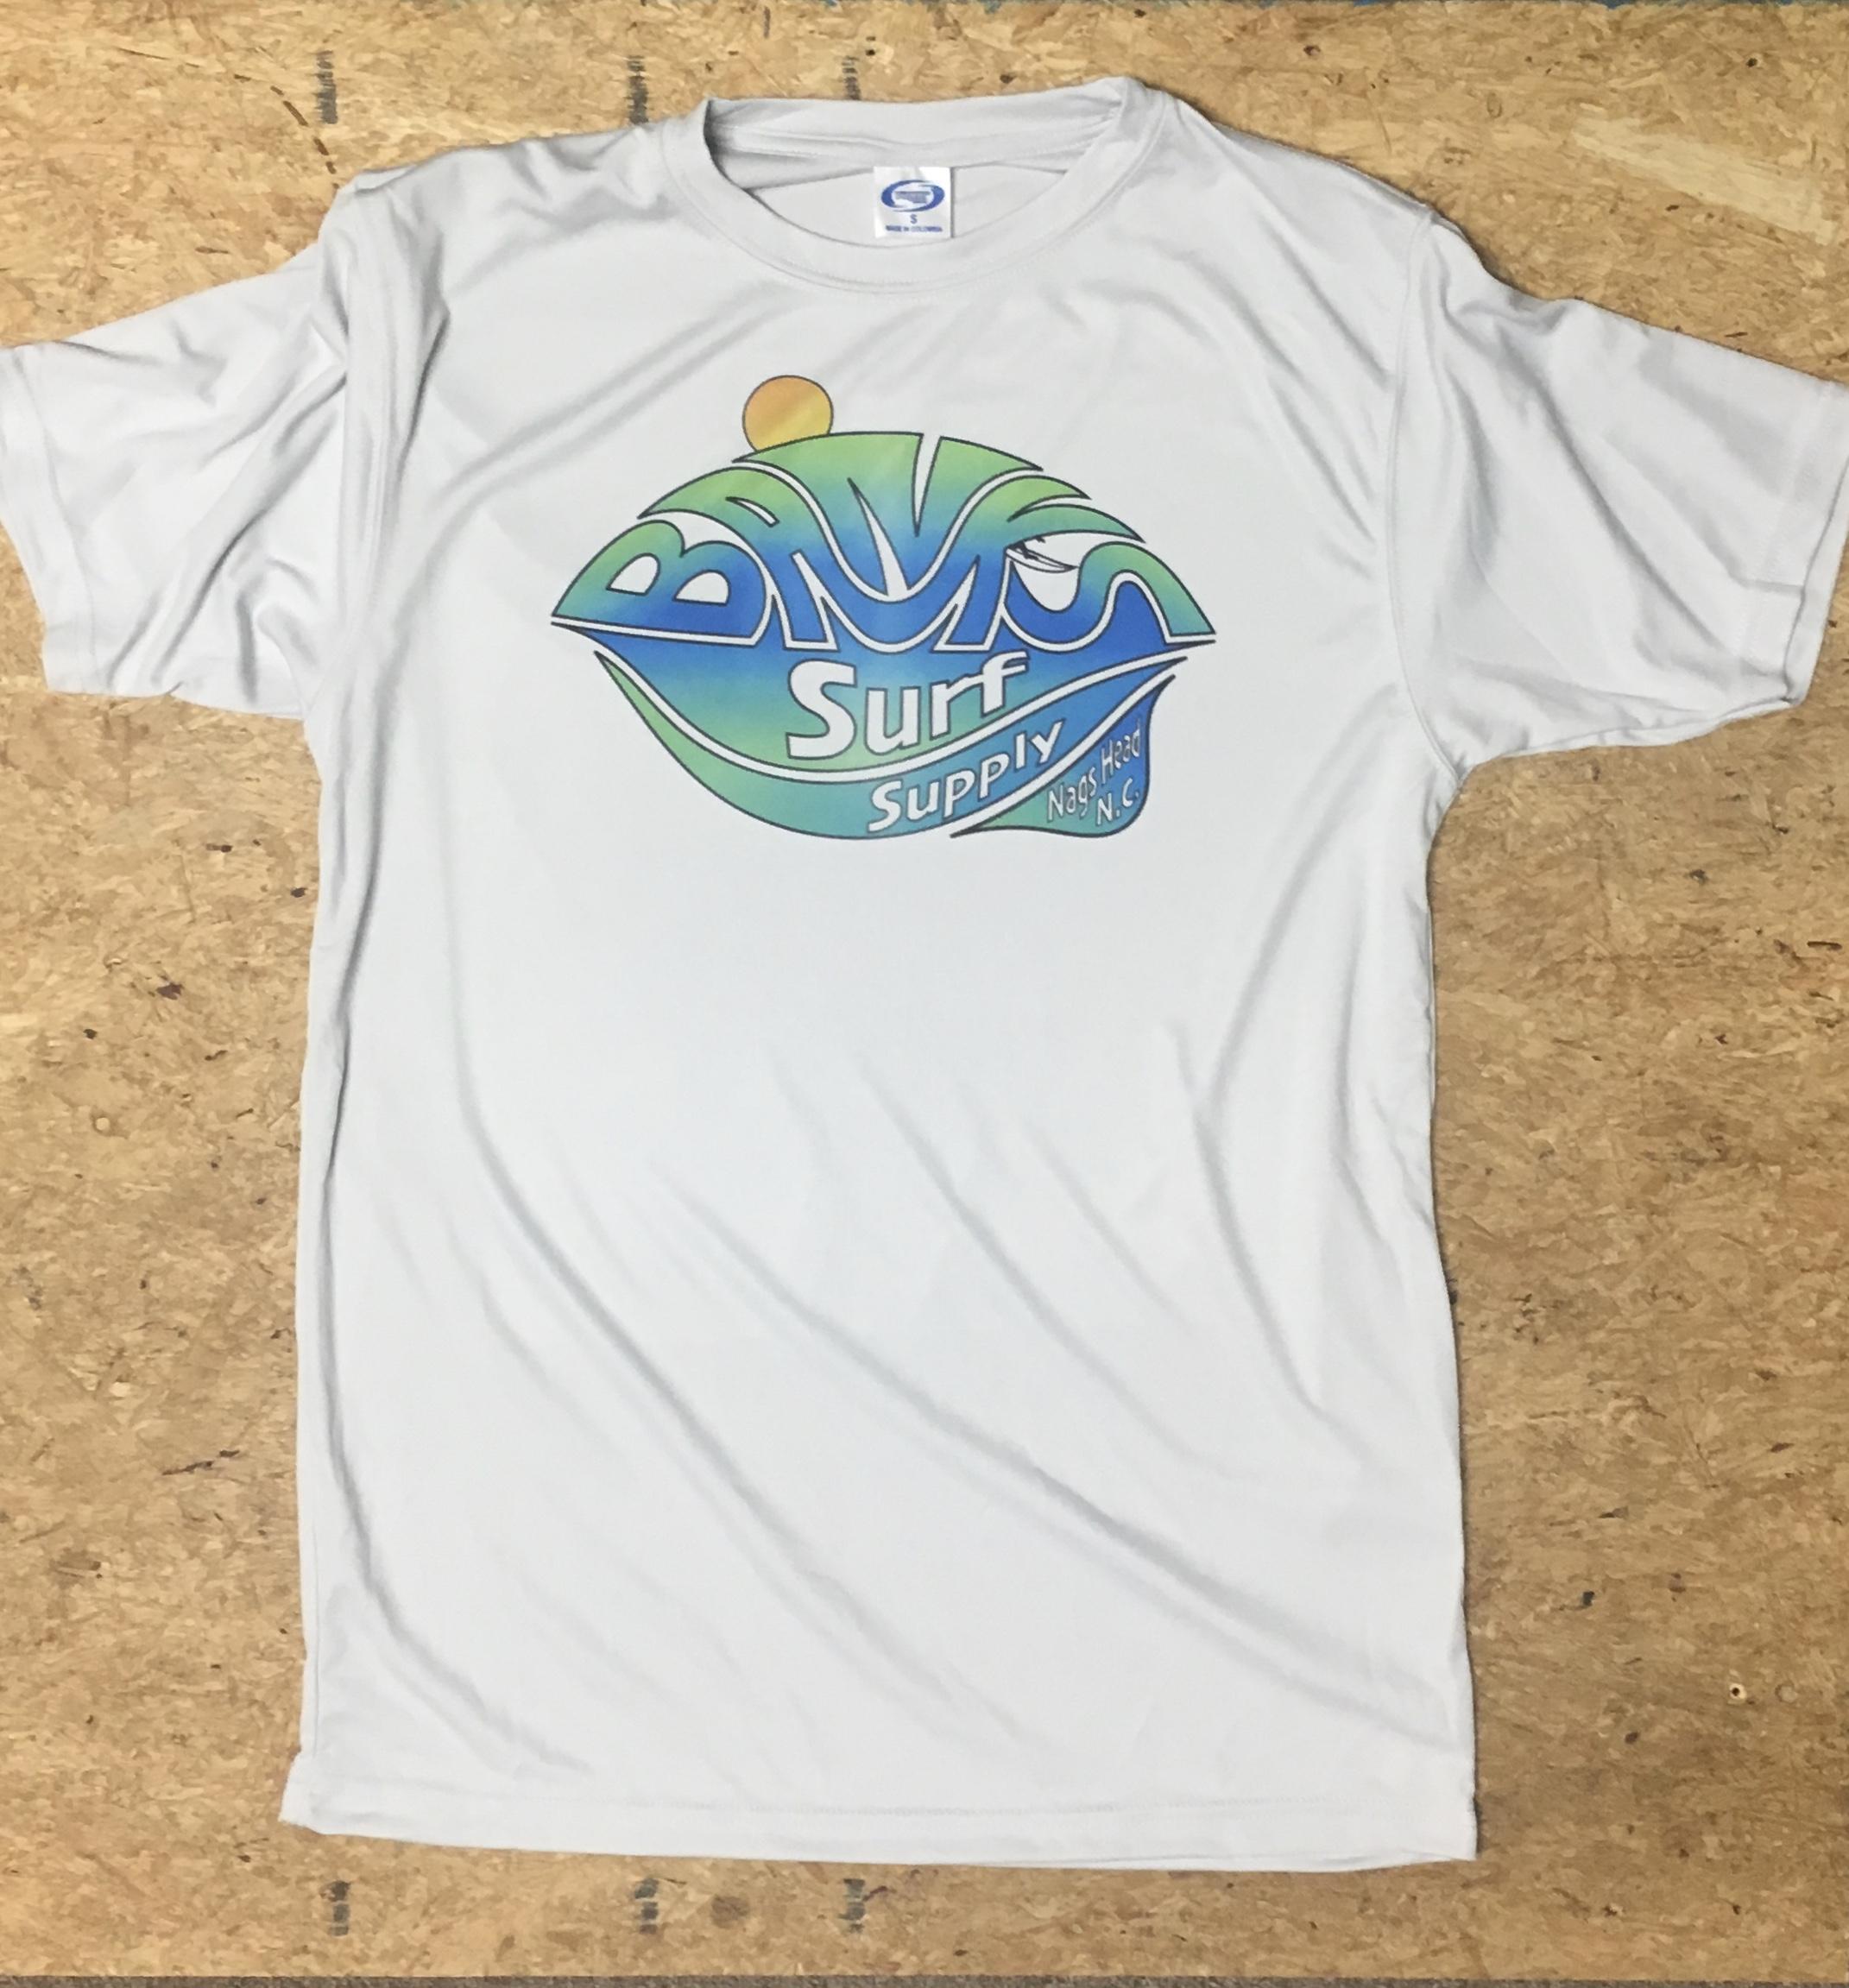 Banks Surf Supply A-Frame Solar Short Sleeve Tee  Pearl Grey